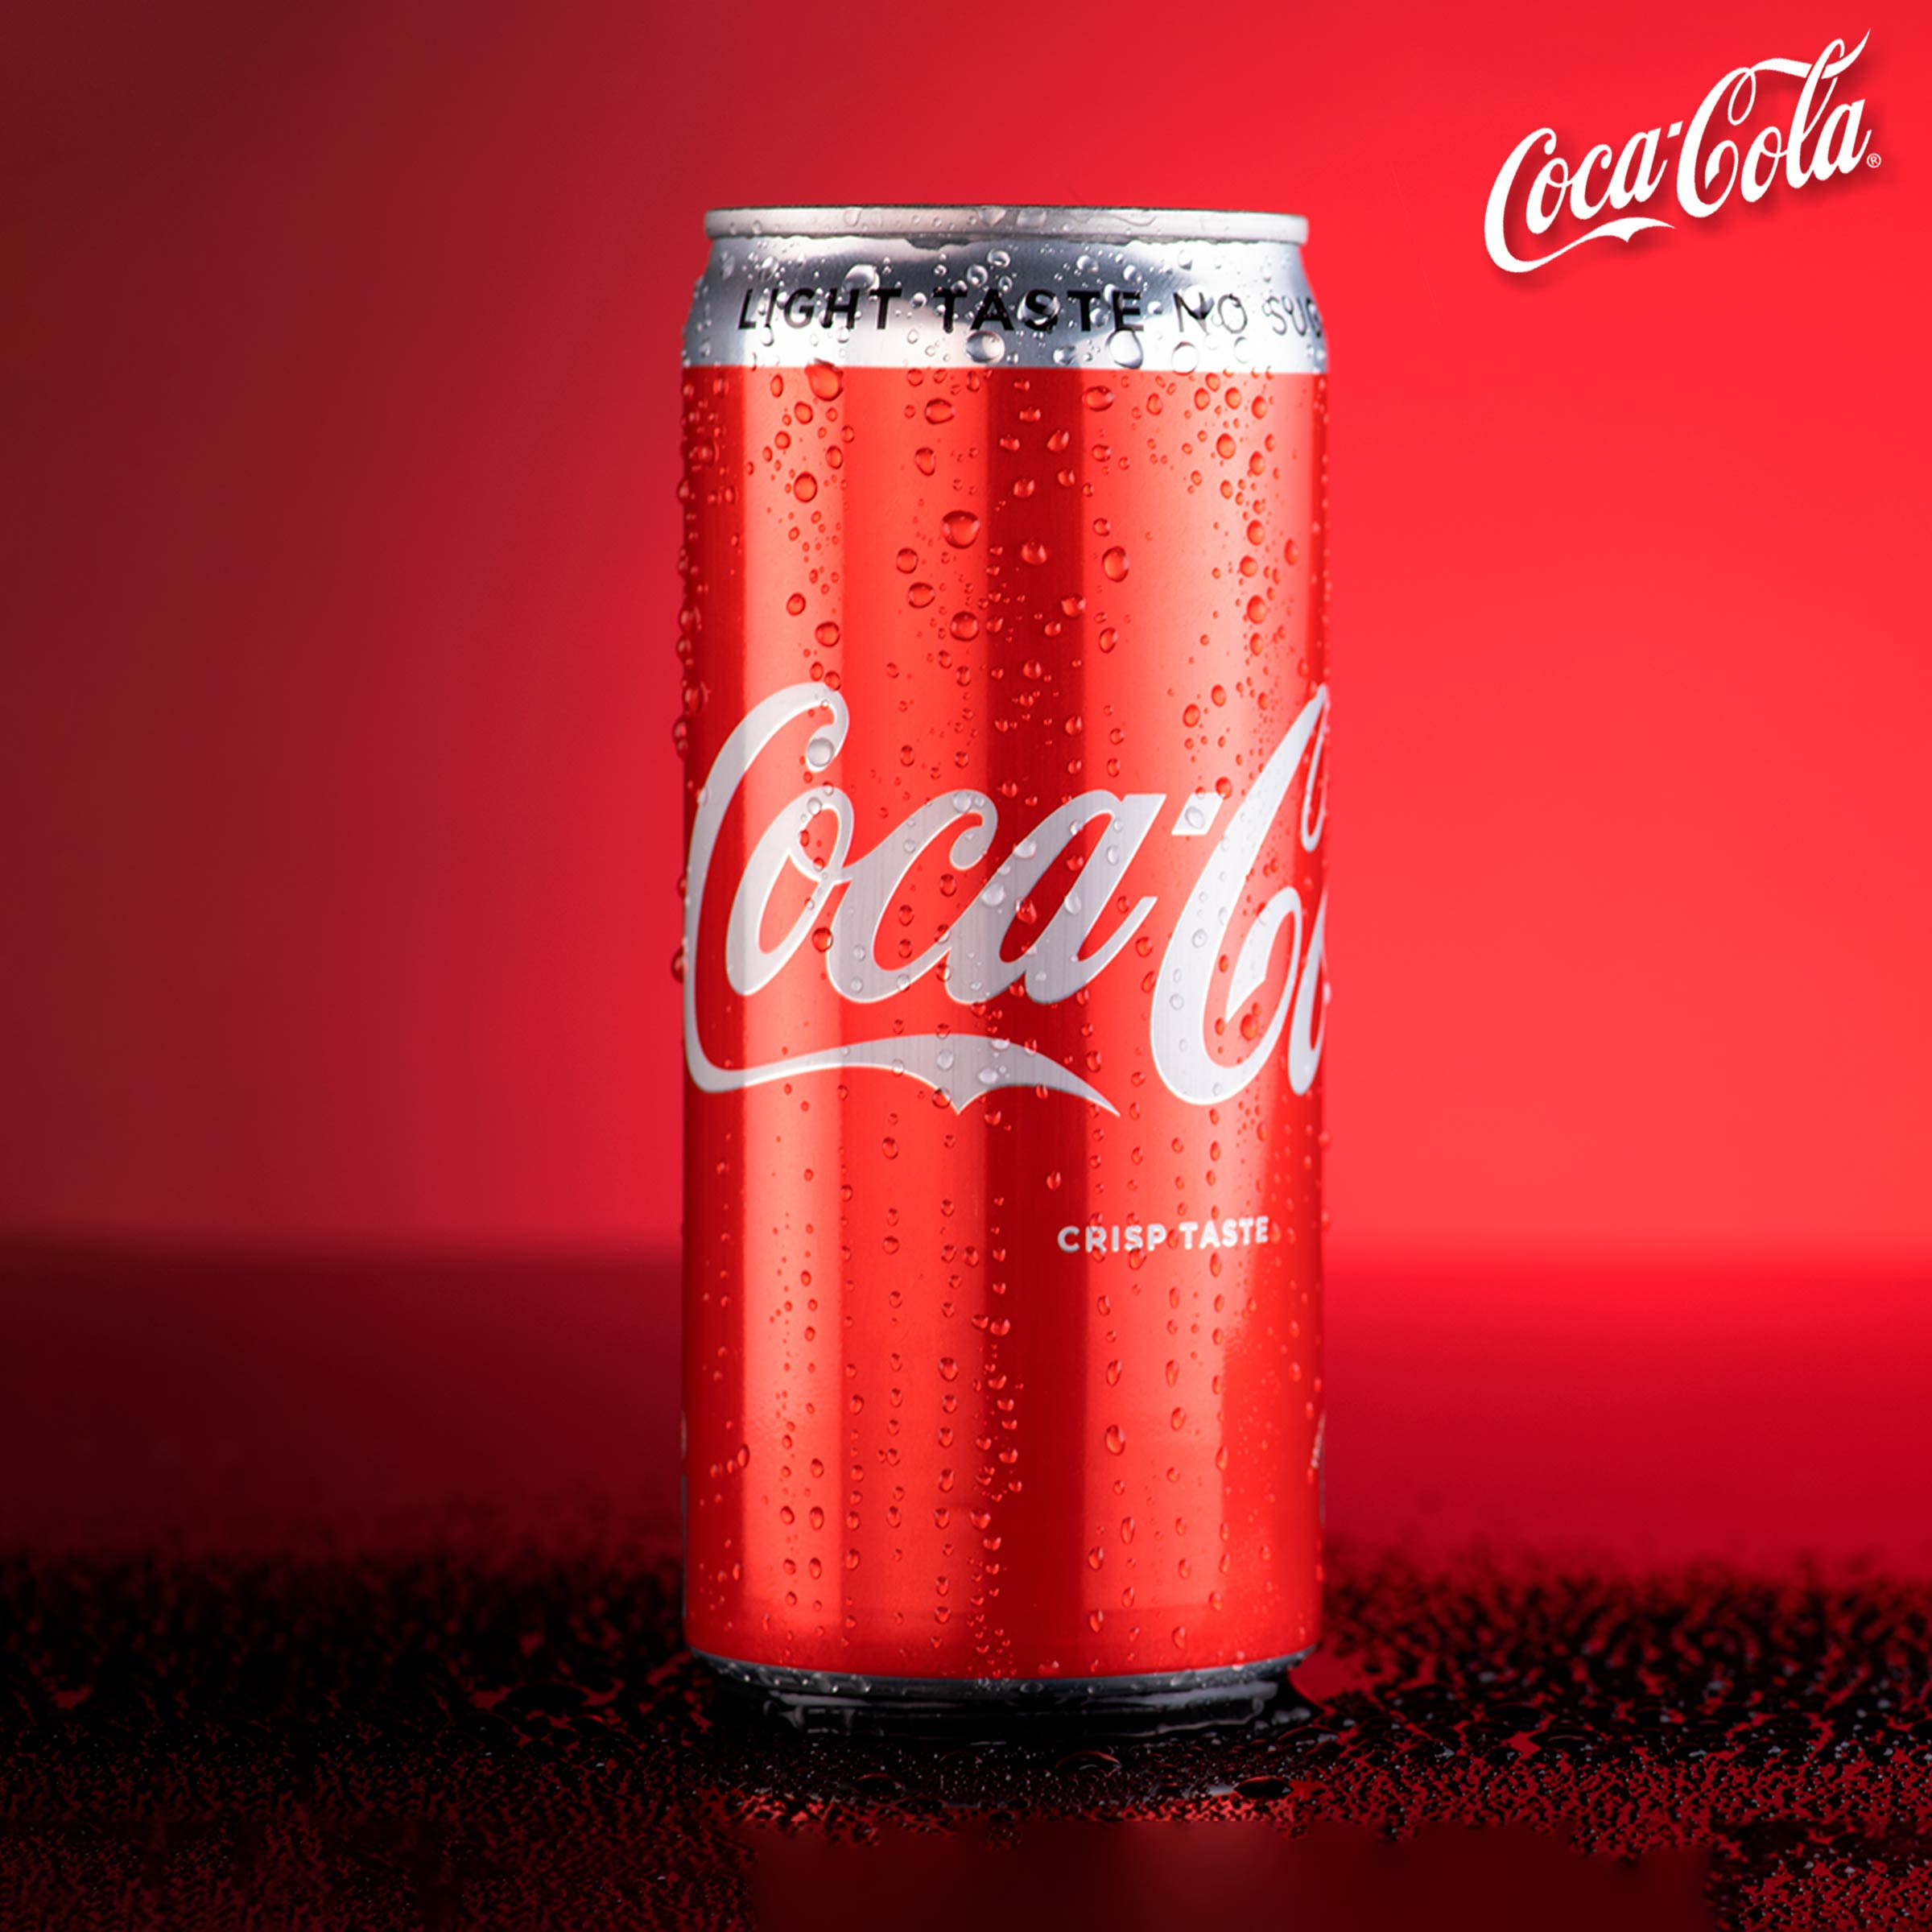 Brownsugr, CocaCola